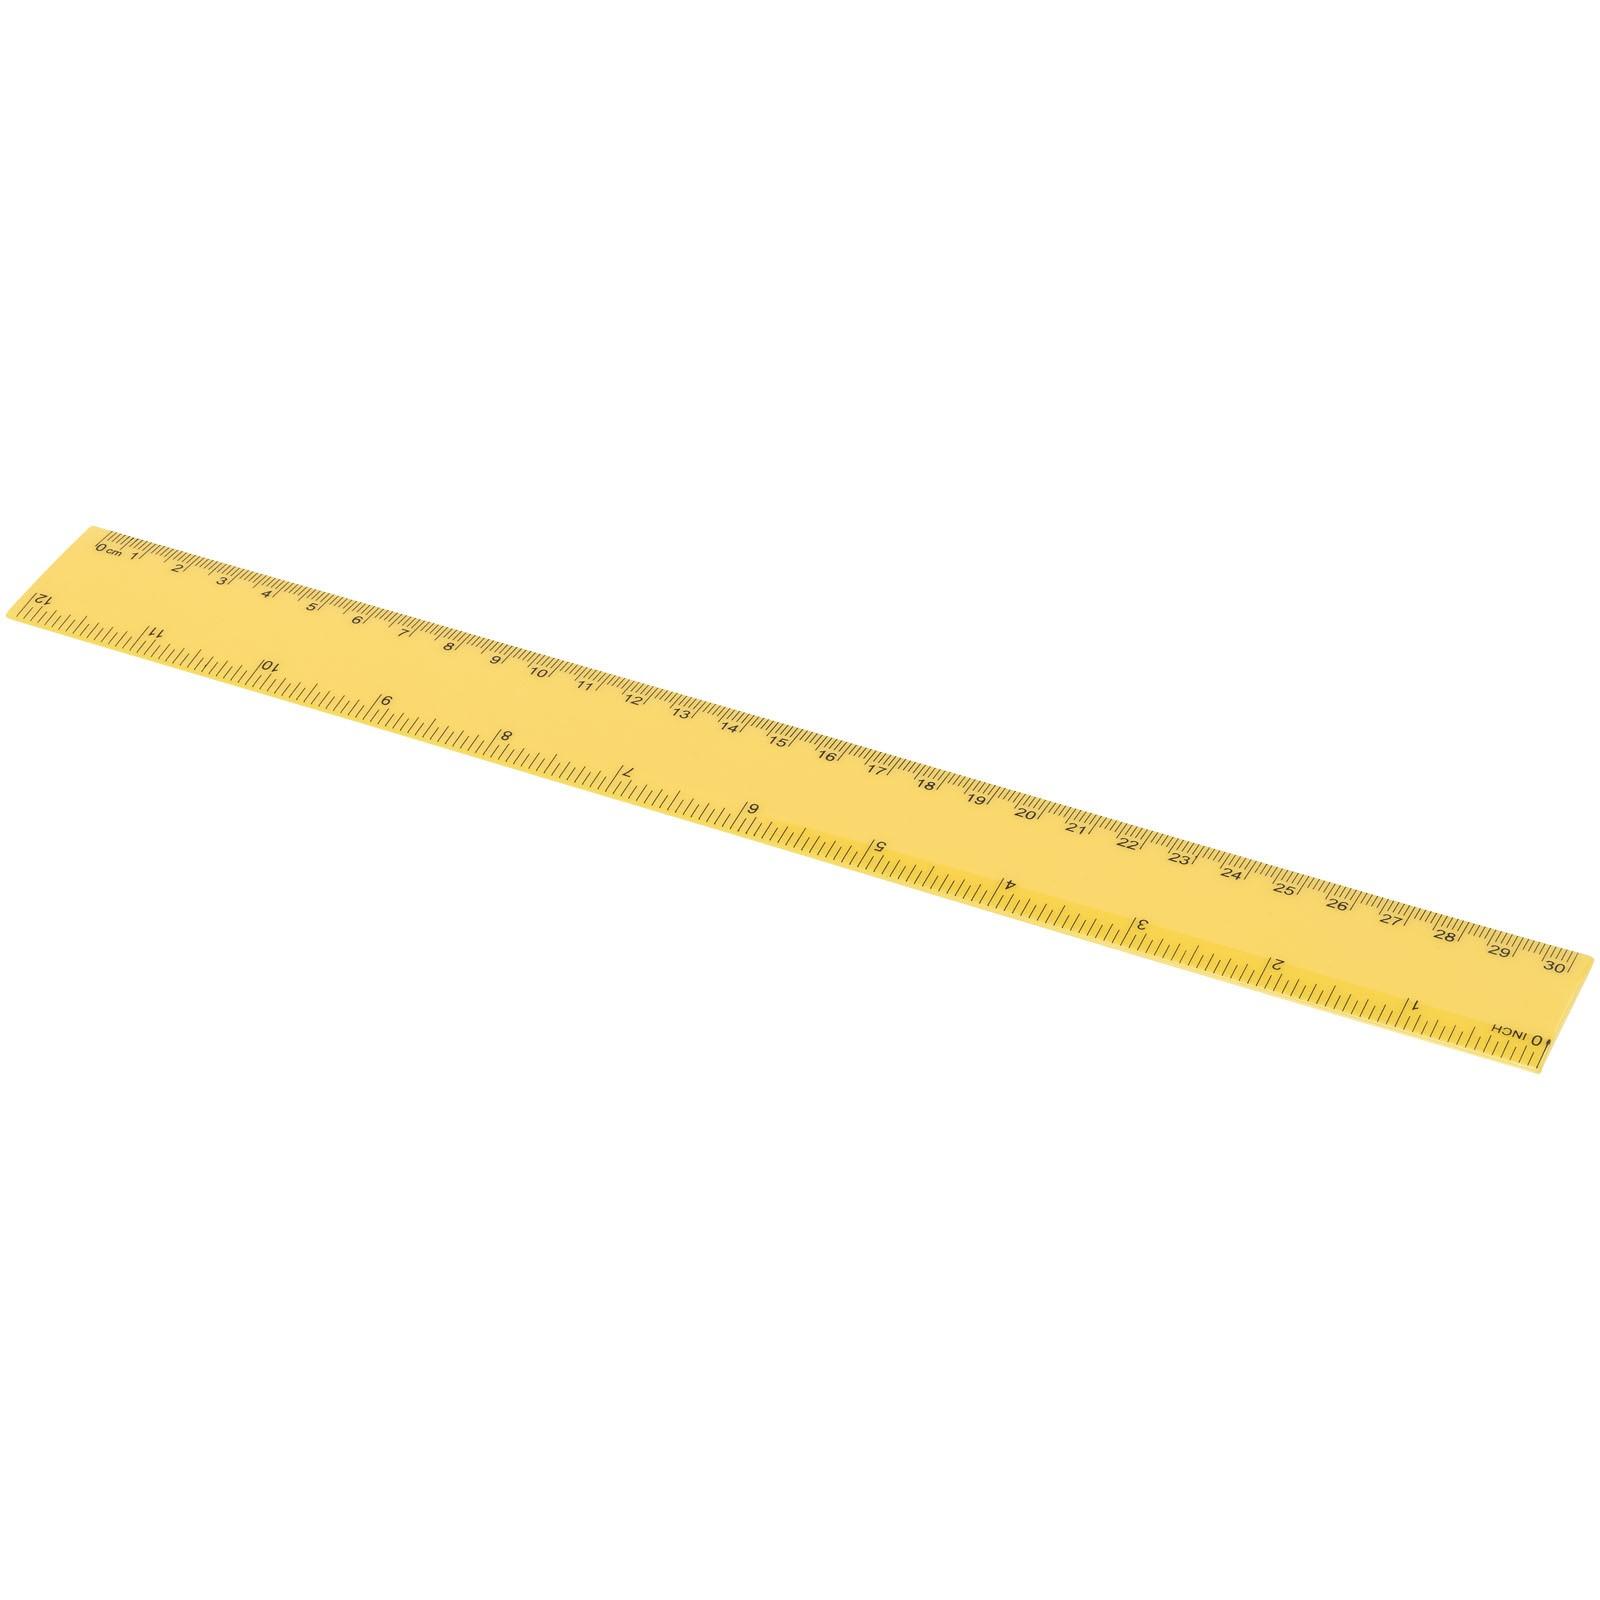 Pravítko Ruly 30 cm - Žlutá